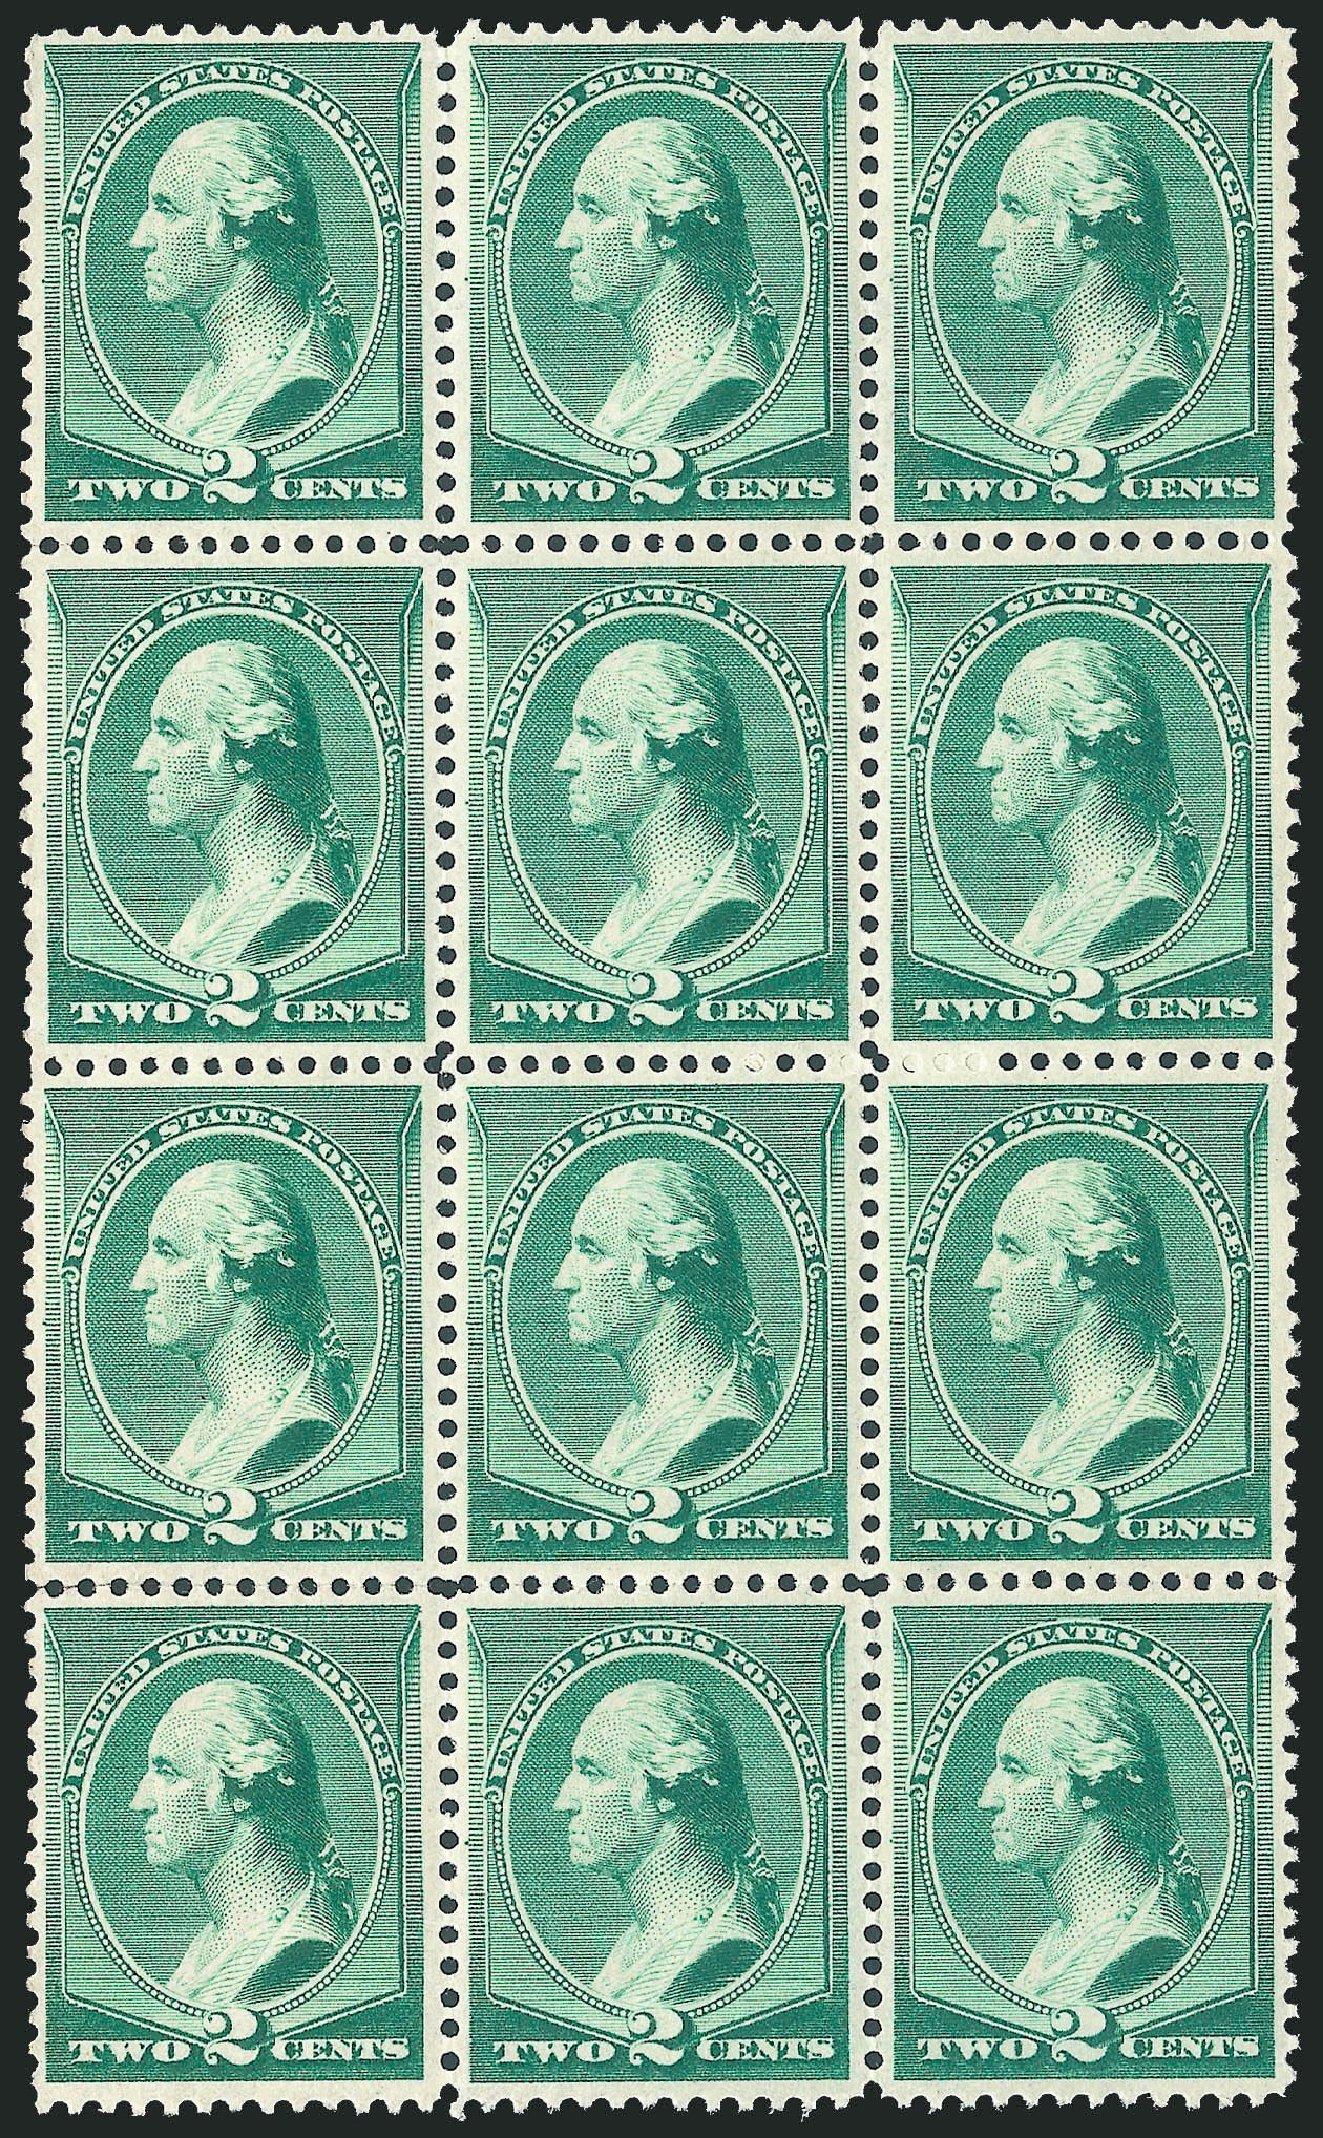 Value of US Stamps Scott Catalog #213 - 2c 1883 Washington. Robert Siegel Auction Galleries, Jul 2013, Sale 1050, Lot 319